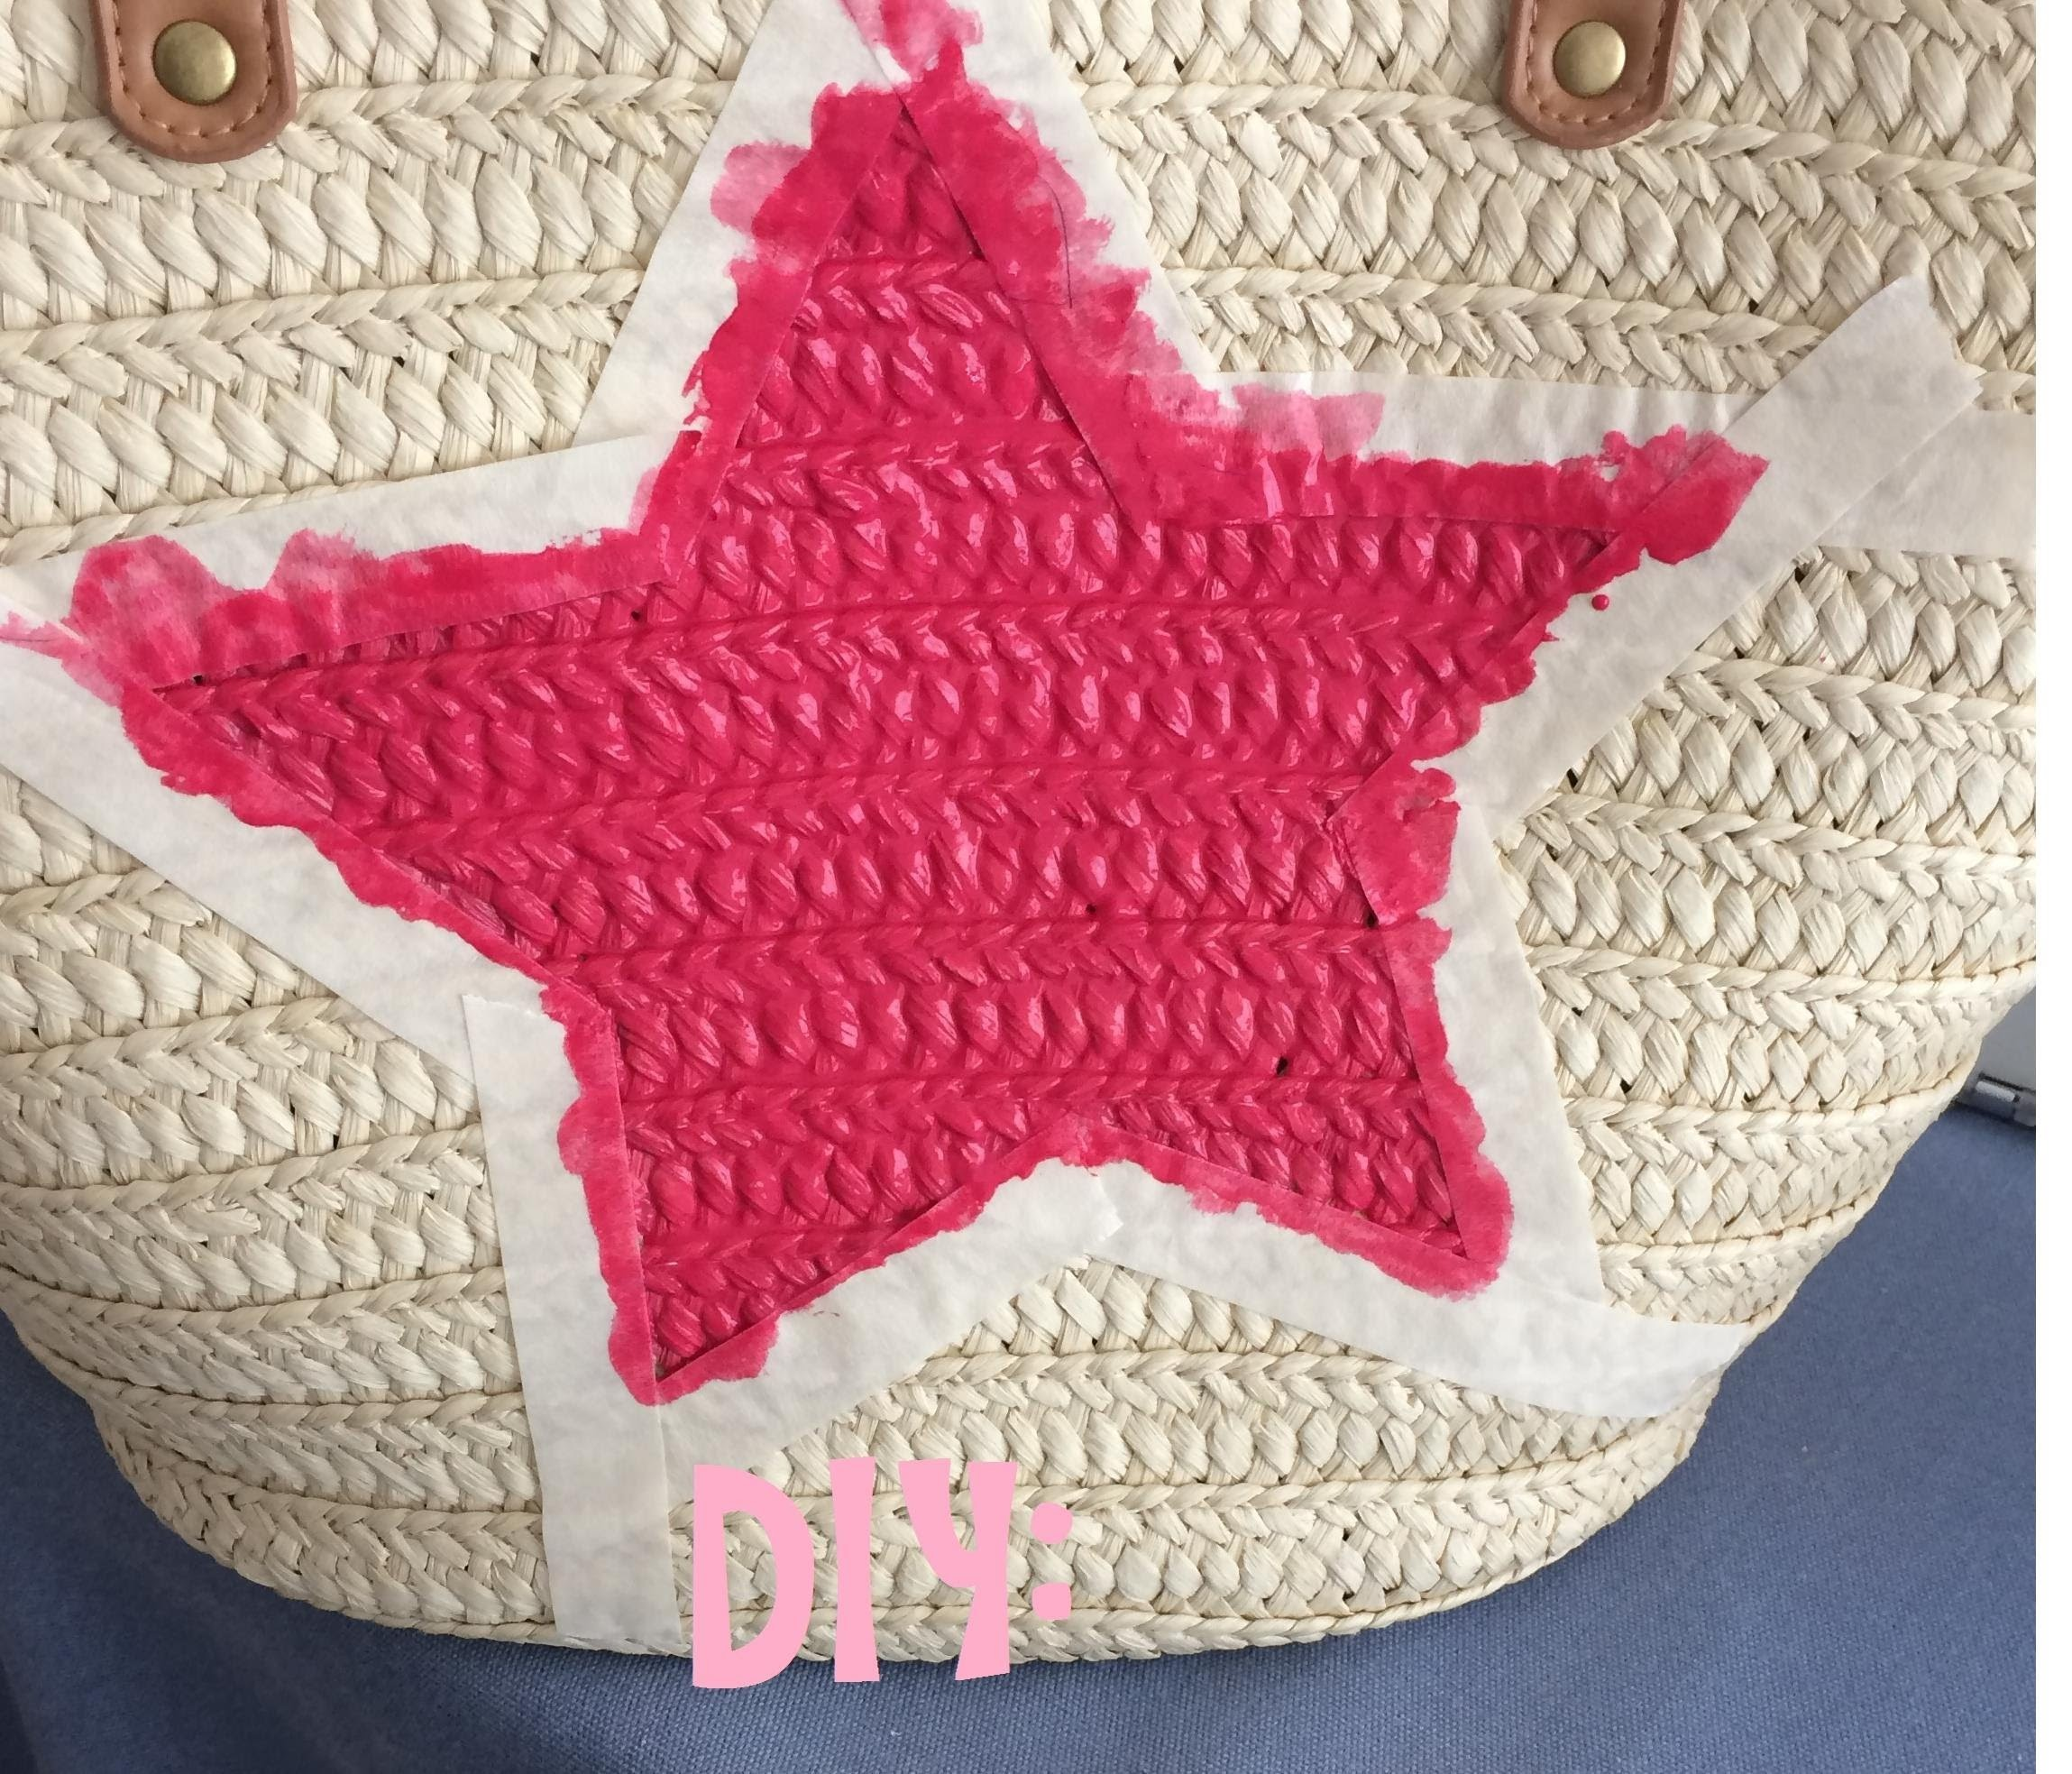 DIY Customiza tu capazo. Wicker Bag